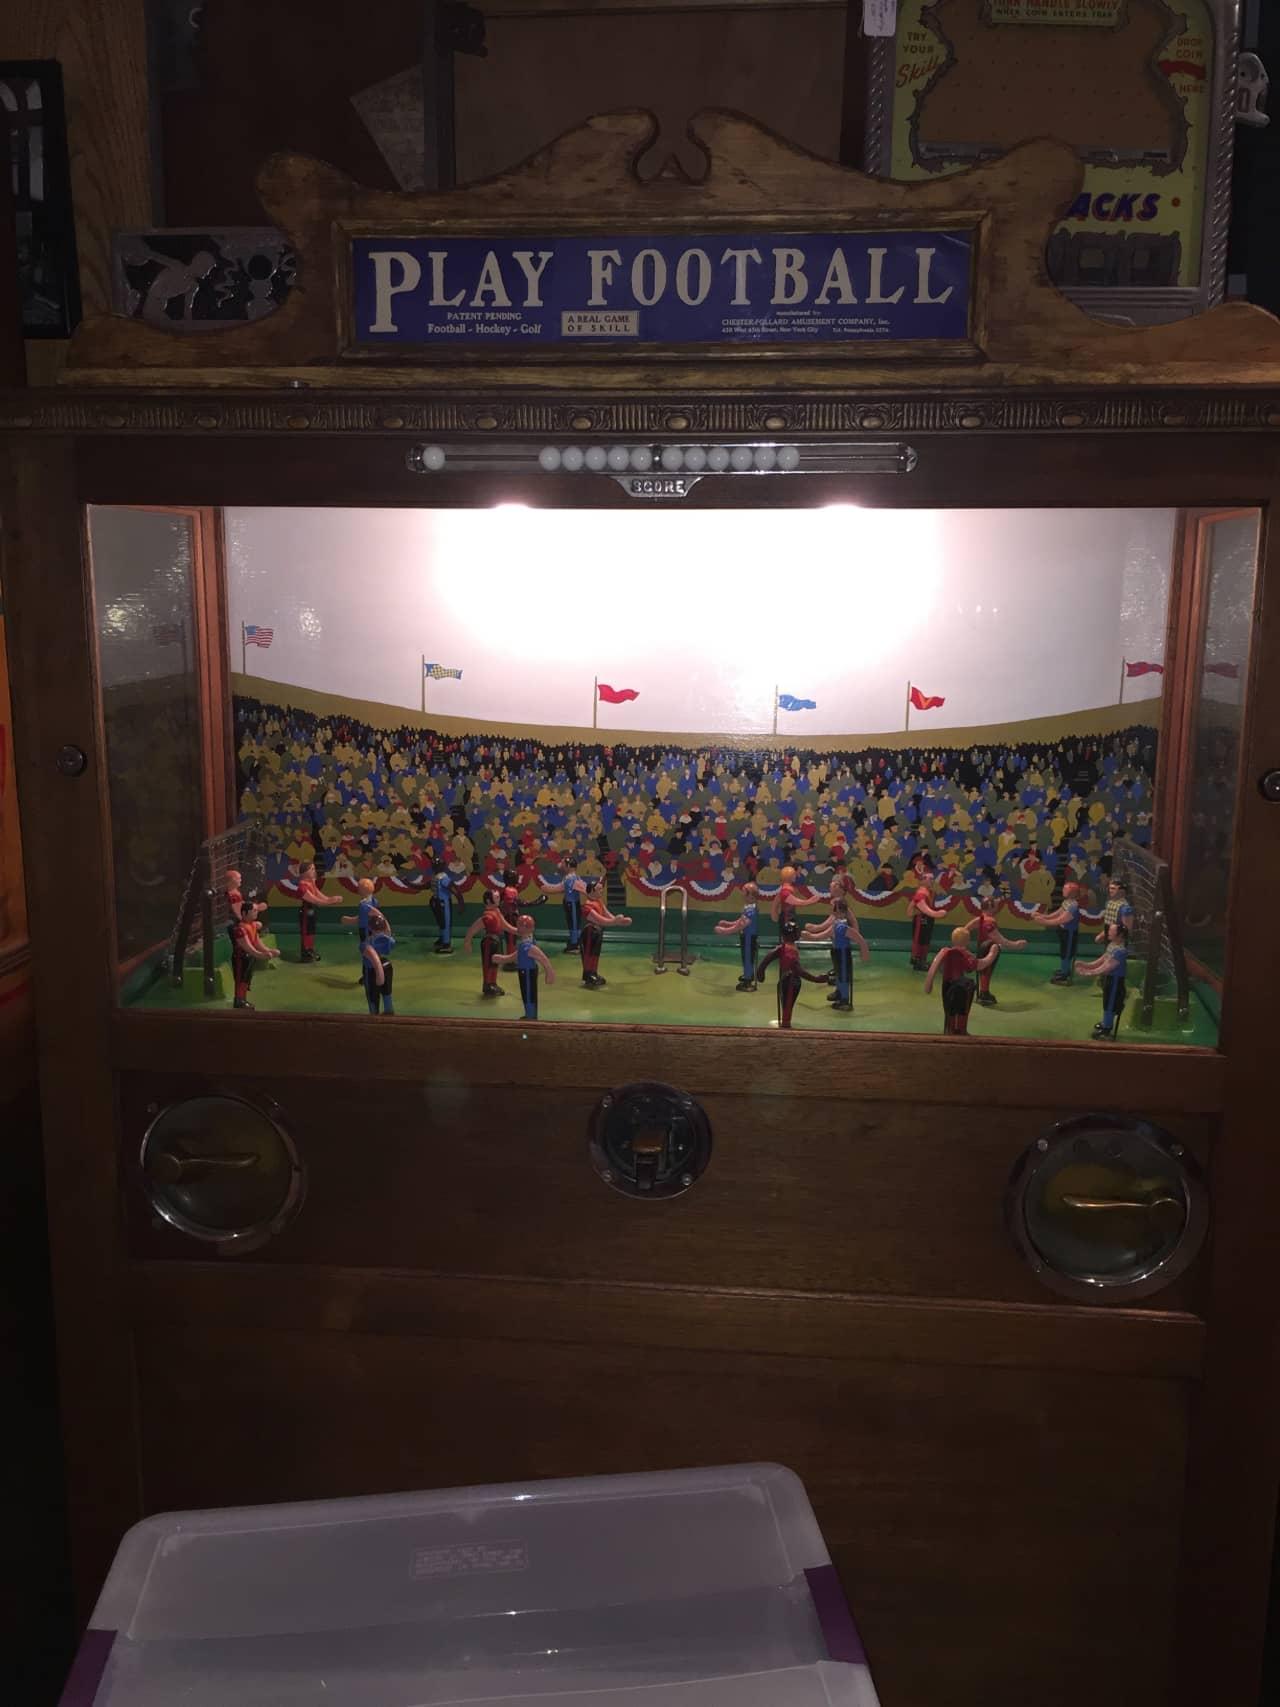 CHESTER POLLARD PLAY FOOTBALL